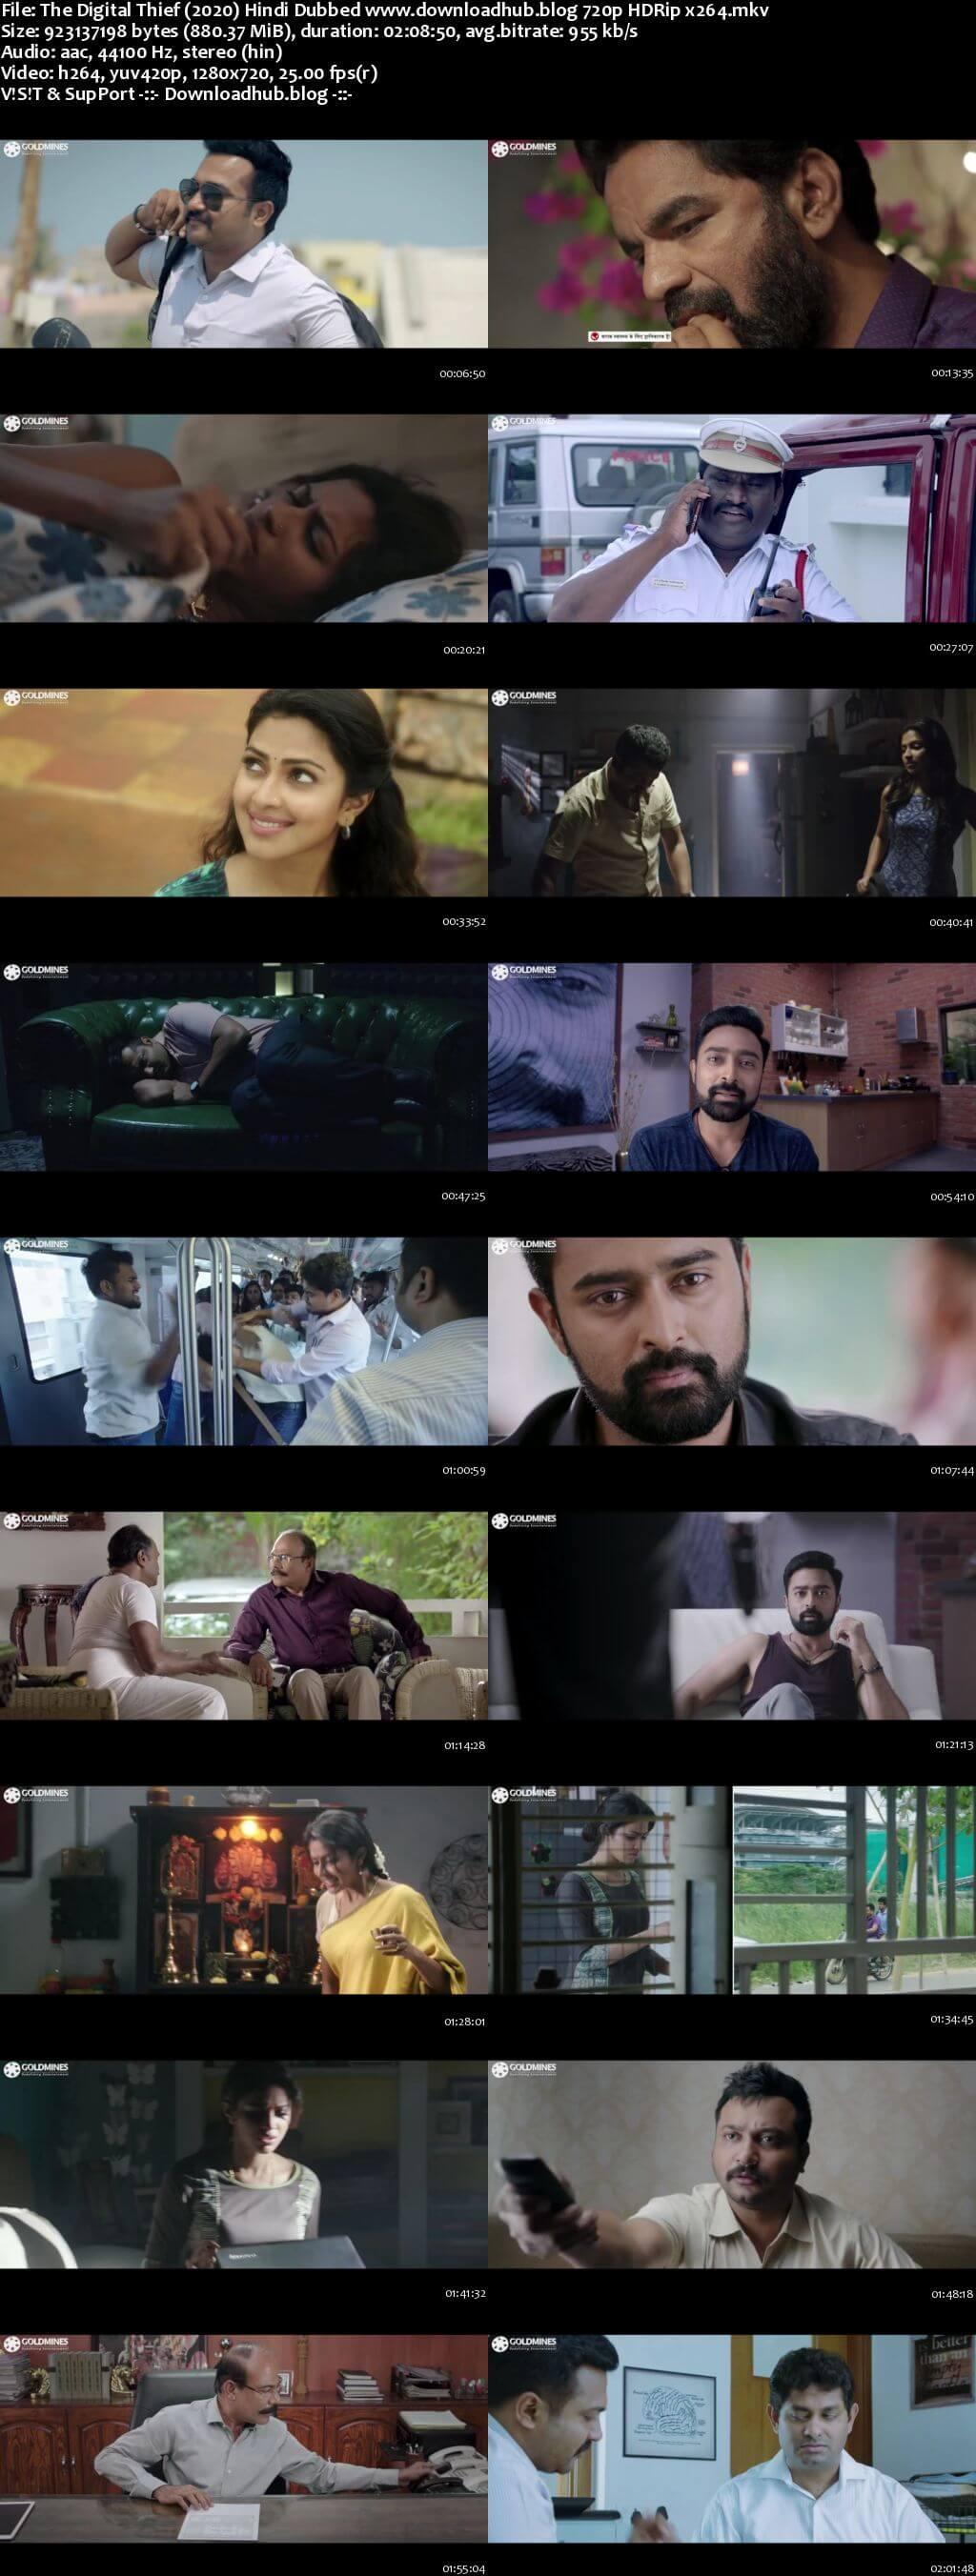 The Digital Thief 2020 Hindi Dubbed 720p HDRip x264